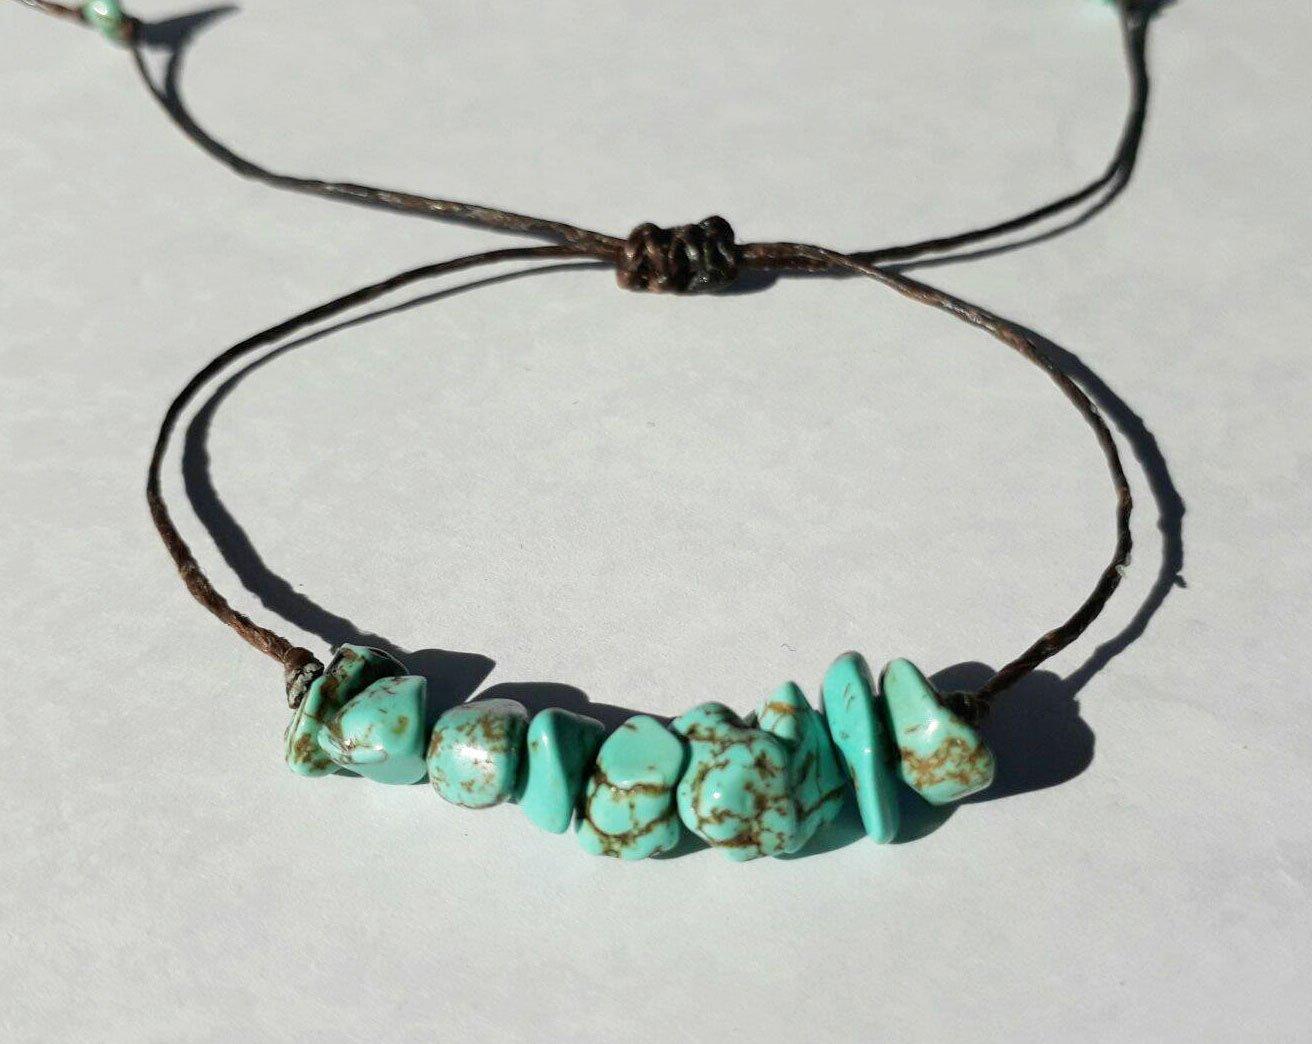 Turquoise bracelets for Men and Women